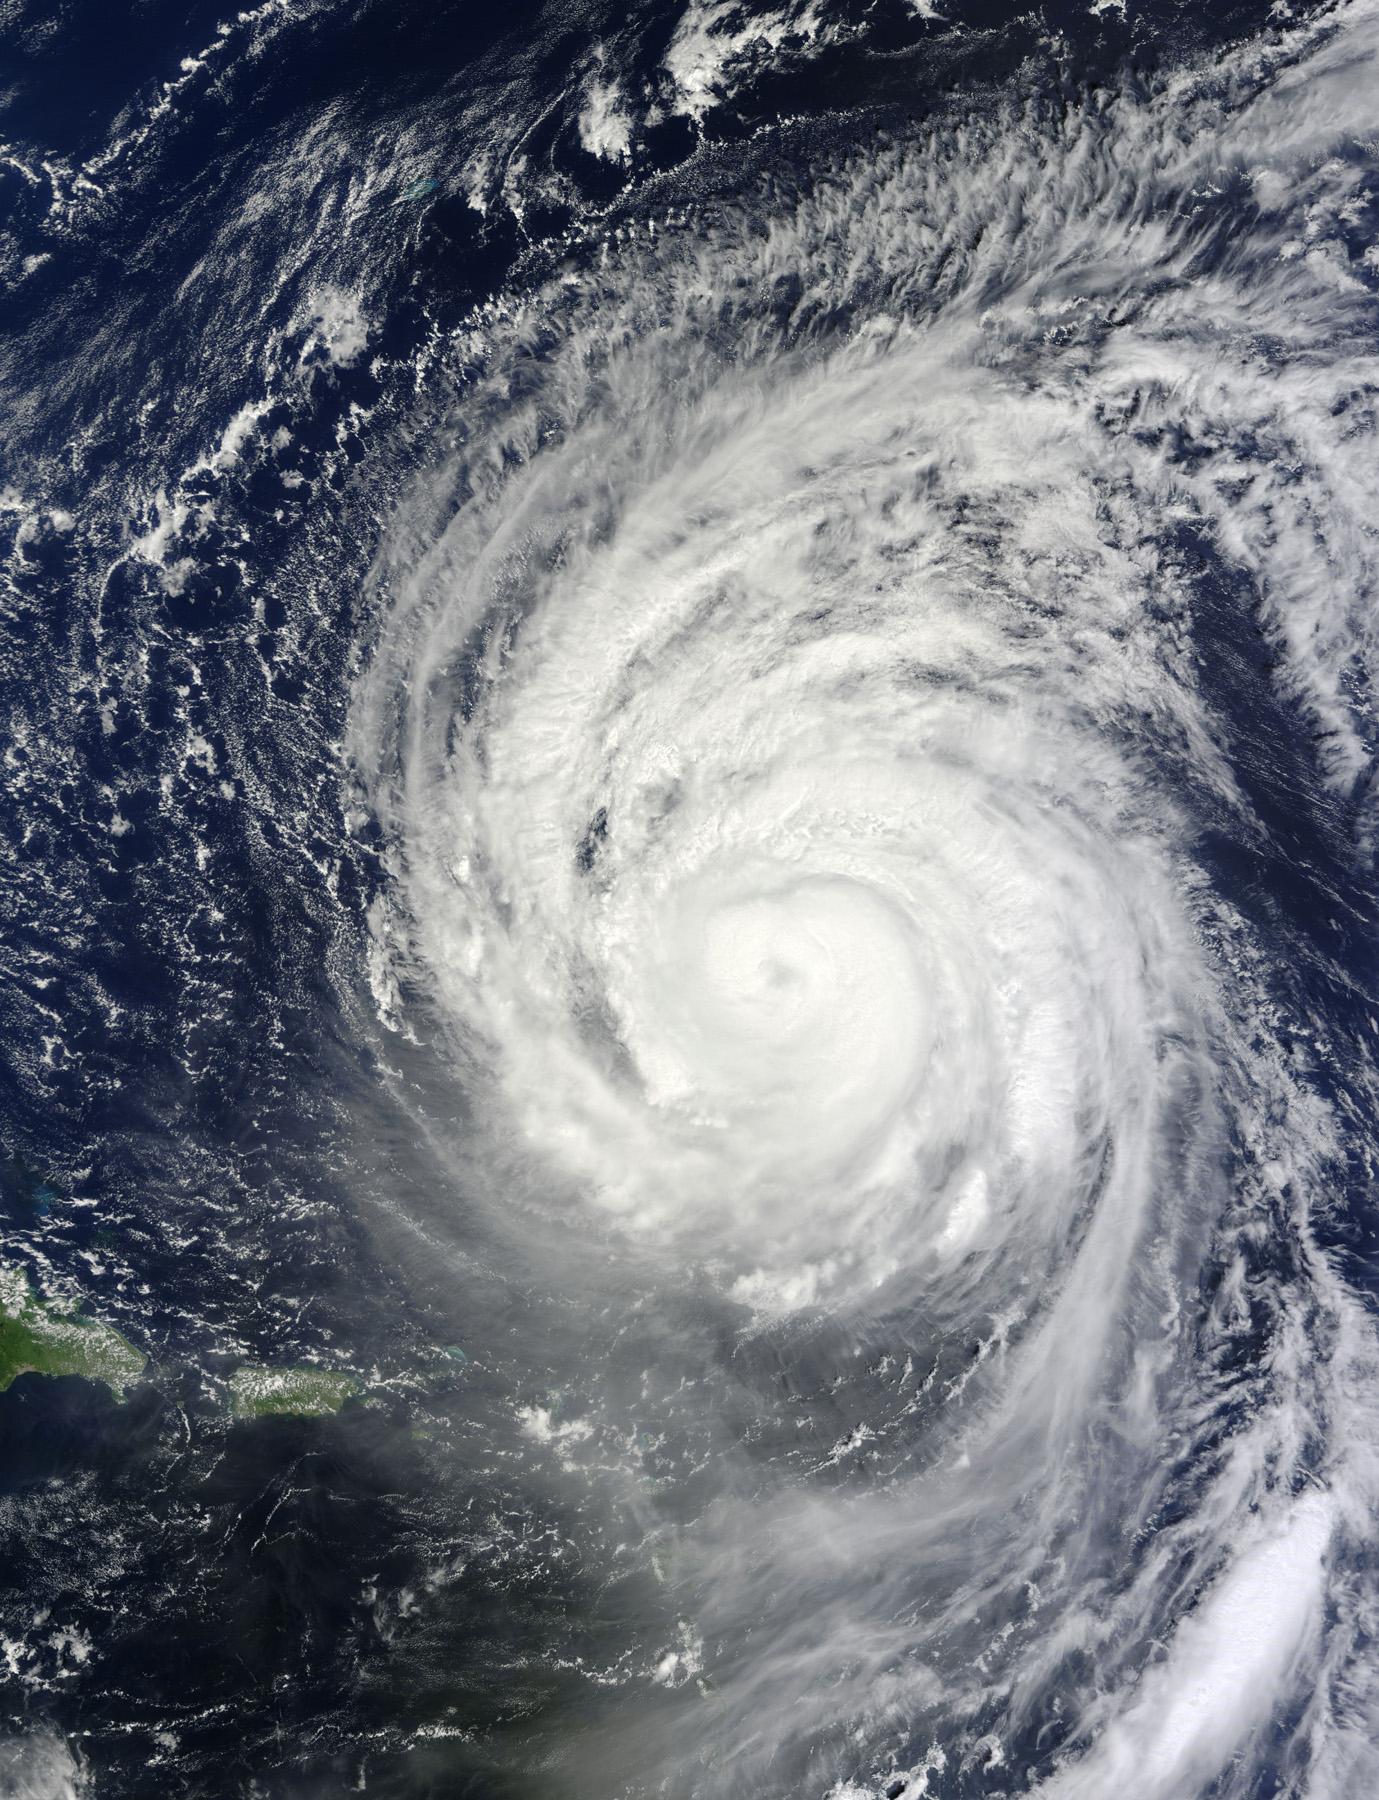 Hurricane Season 2010: Tropical Storm Igor